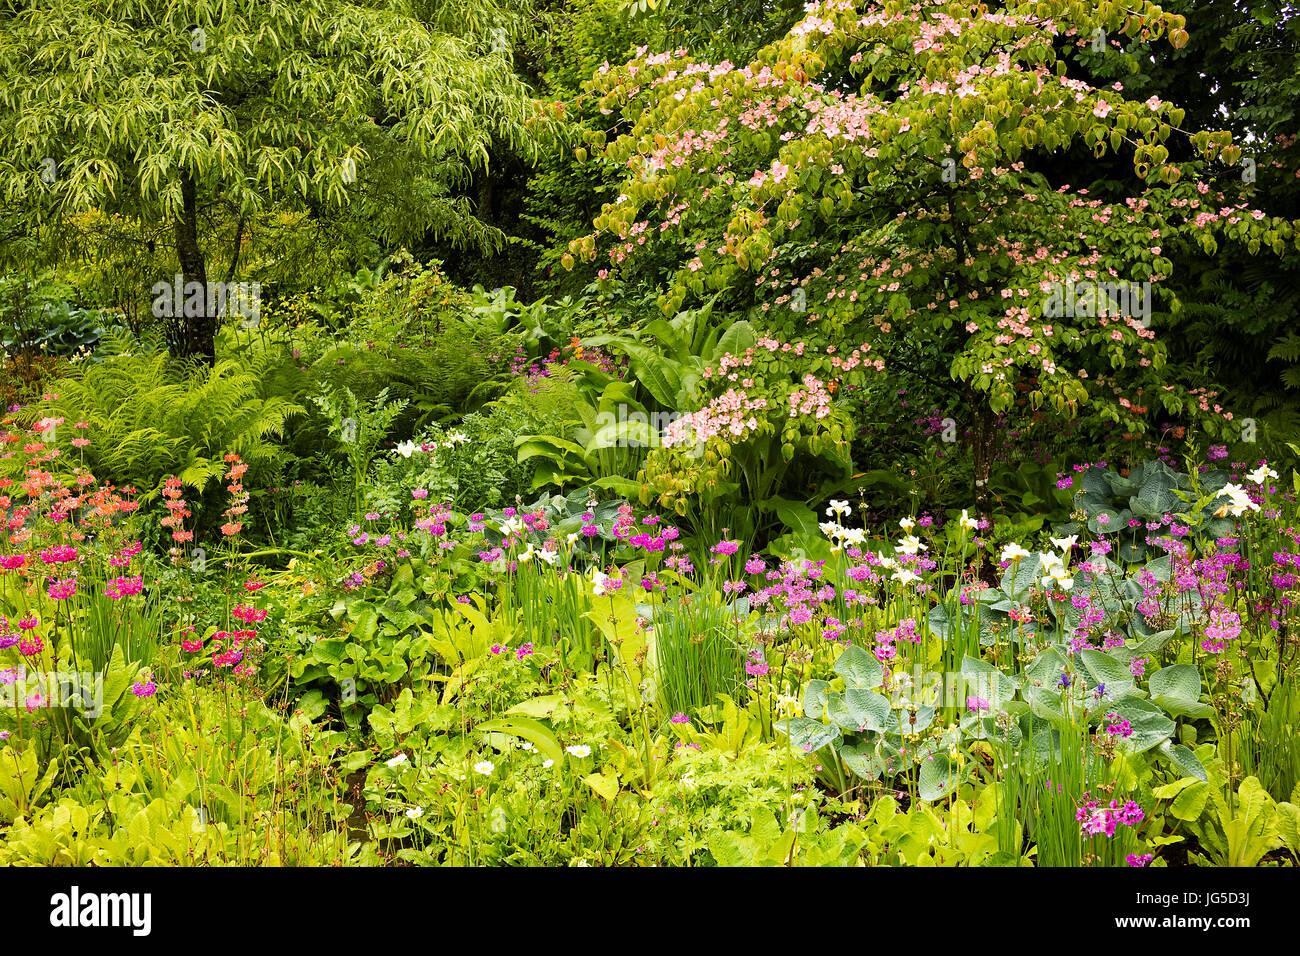 Part of the Stream Garden at Aberglasney, Carmarthenshire, Wales, UK - Stock Image